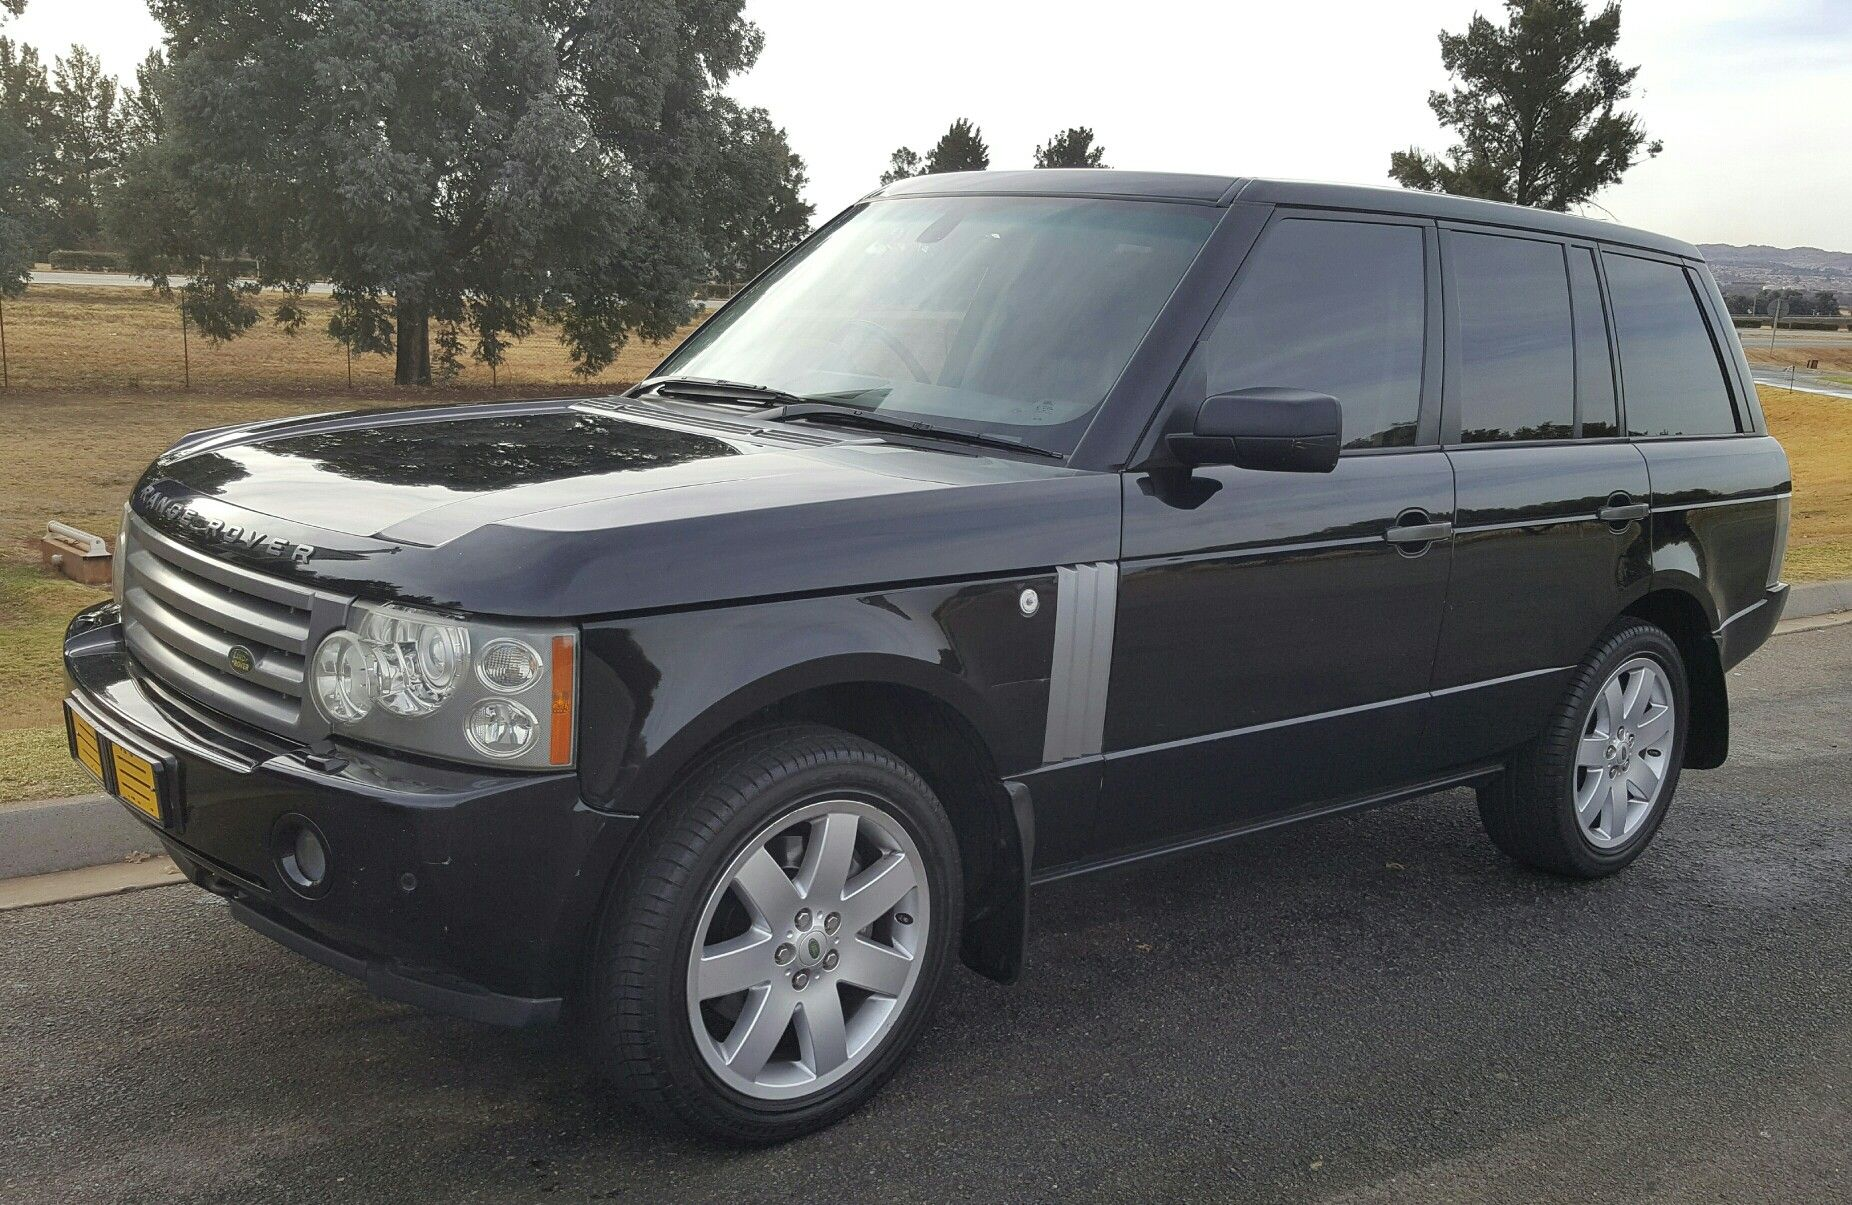 My latest addition to the garage. Range Rover TDV8 Range